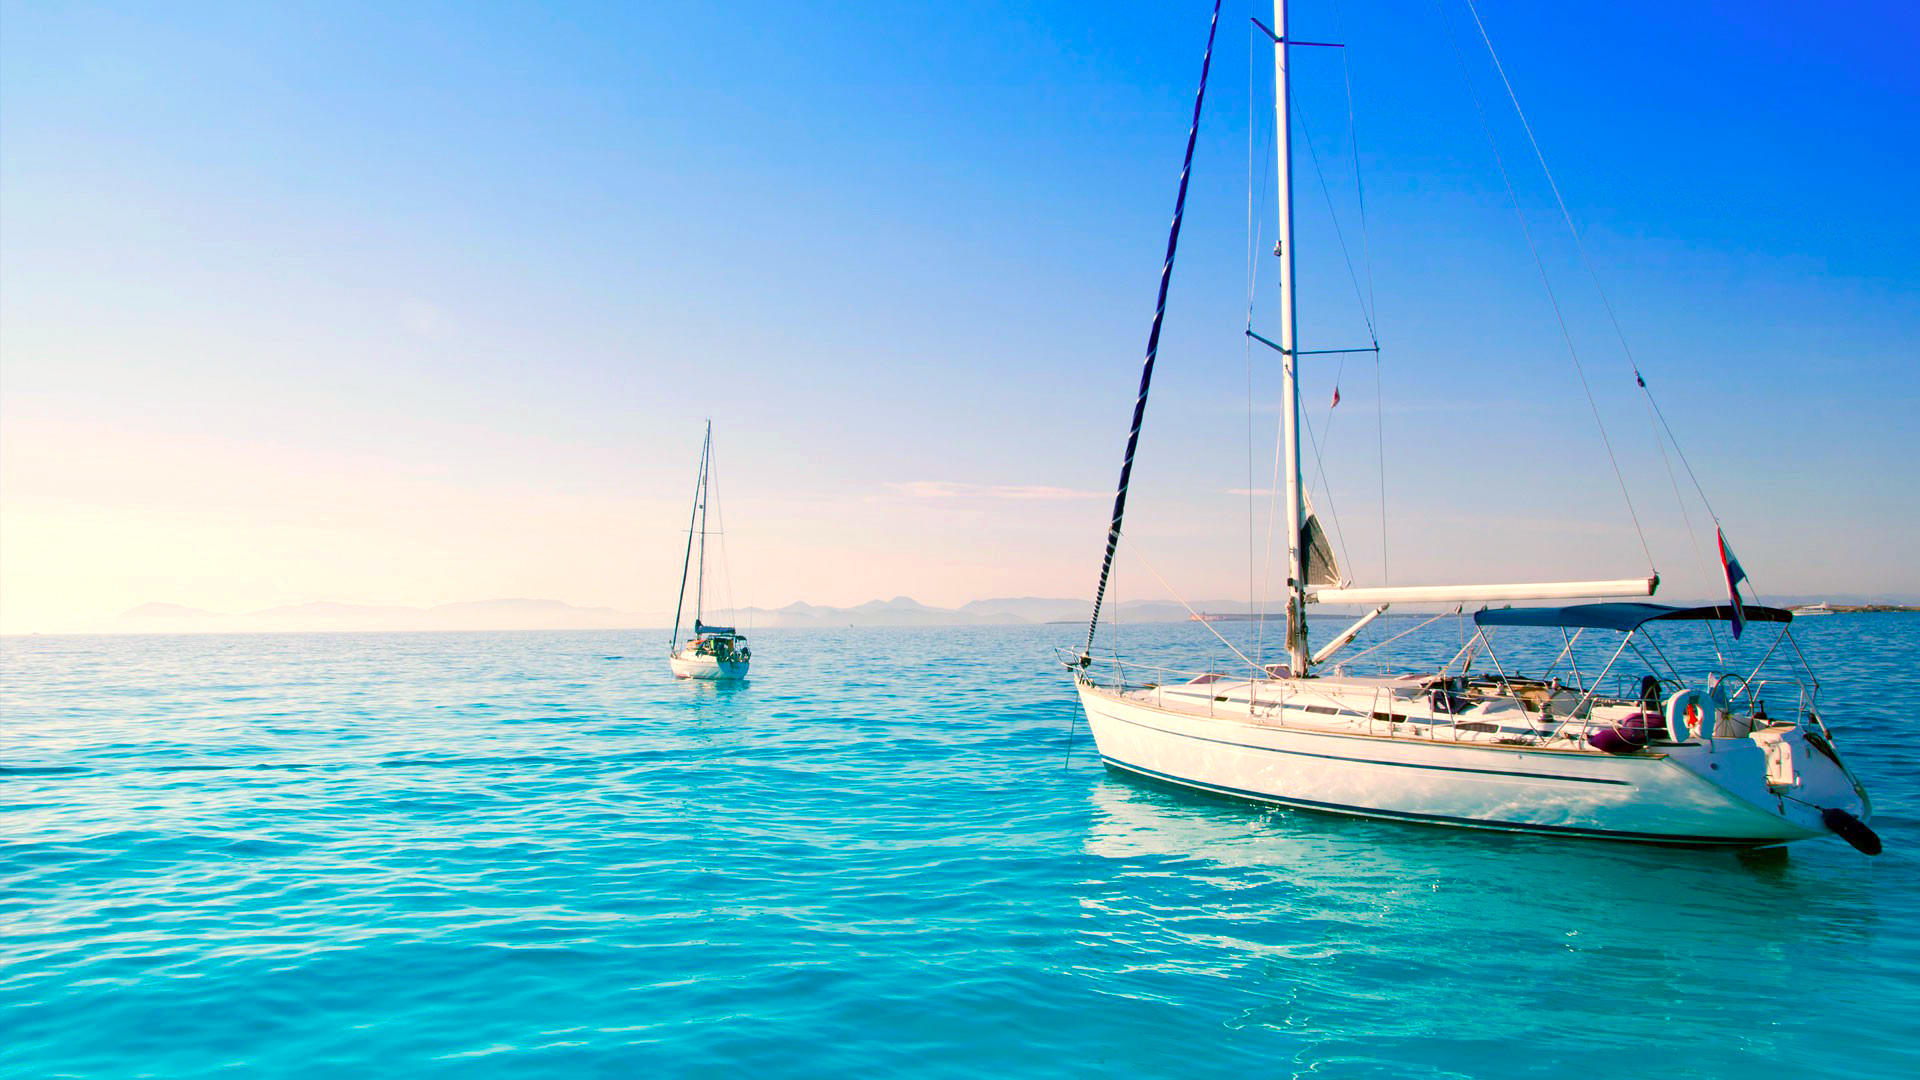 Обои море, яхты, пейзаж